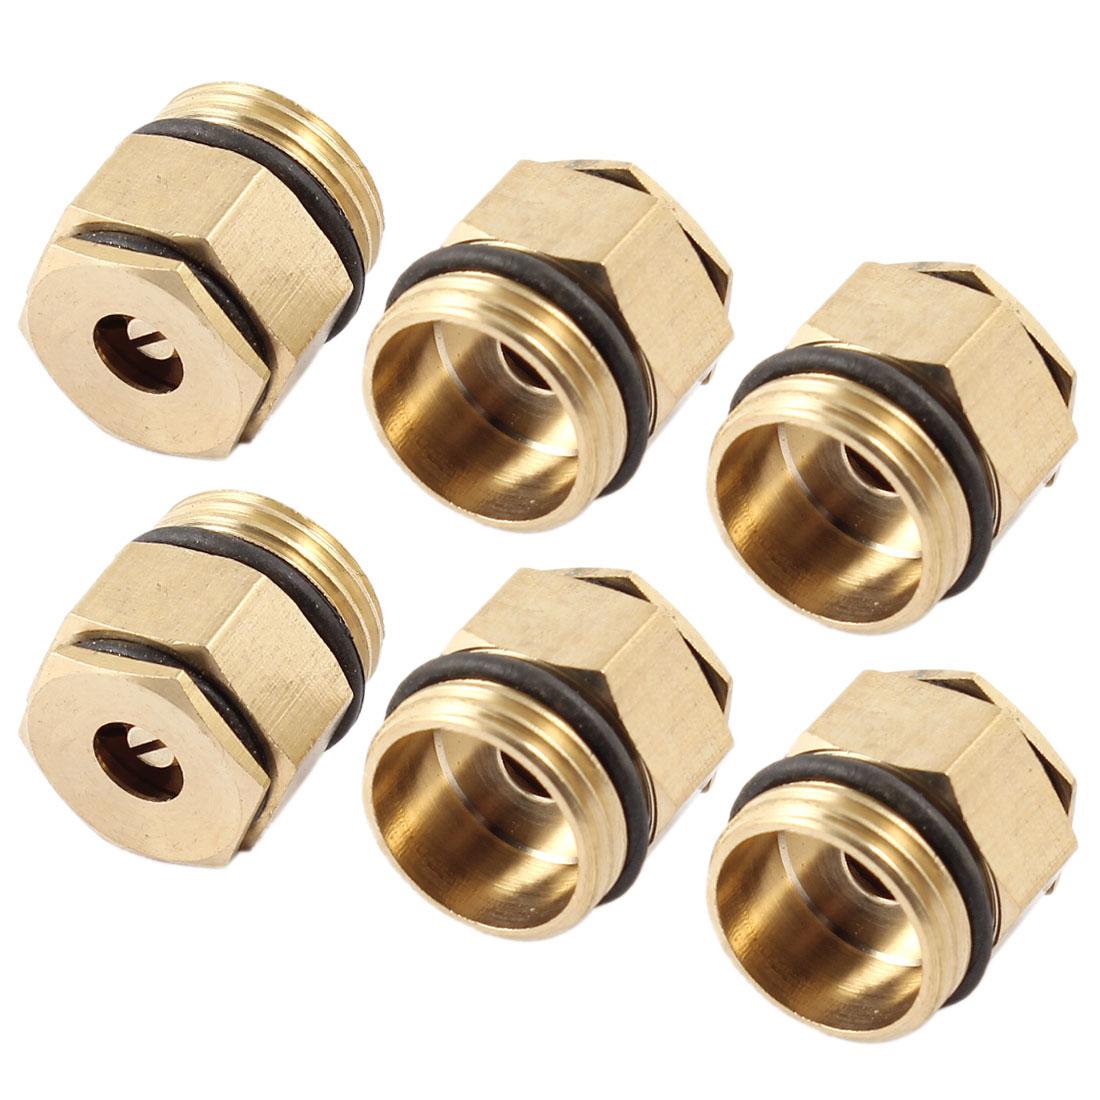 Unique Bargains 6 Pieces Gold Tone Brass 1/2 PT Male Thread Water Lawn Spray Sprayer Nozzle